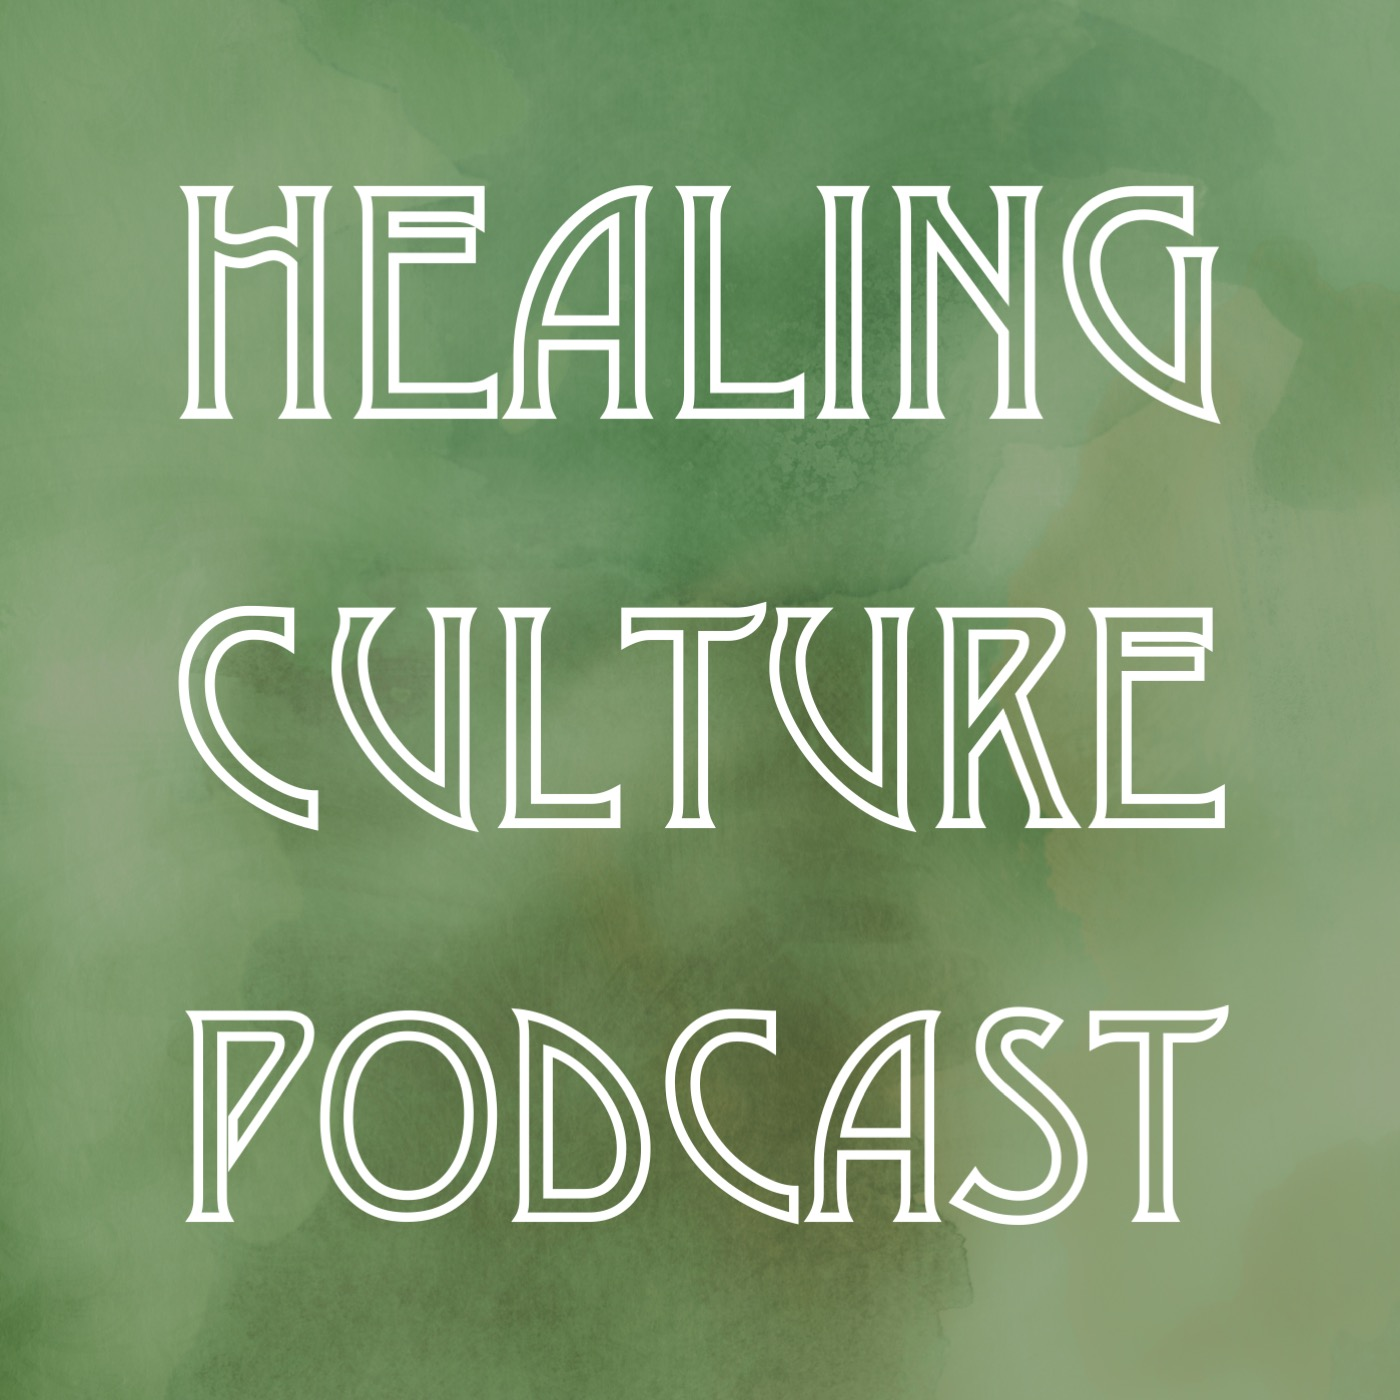 Healing Culture Podcast show art